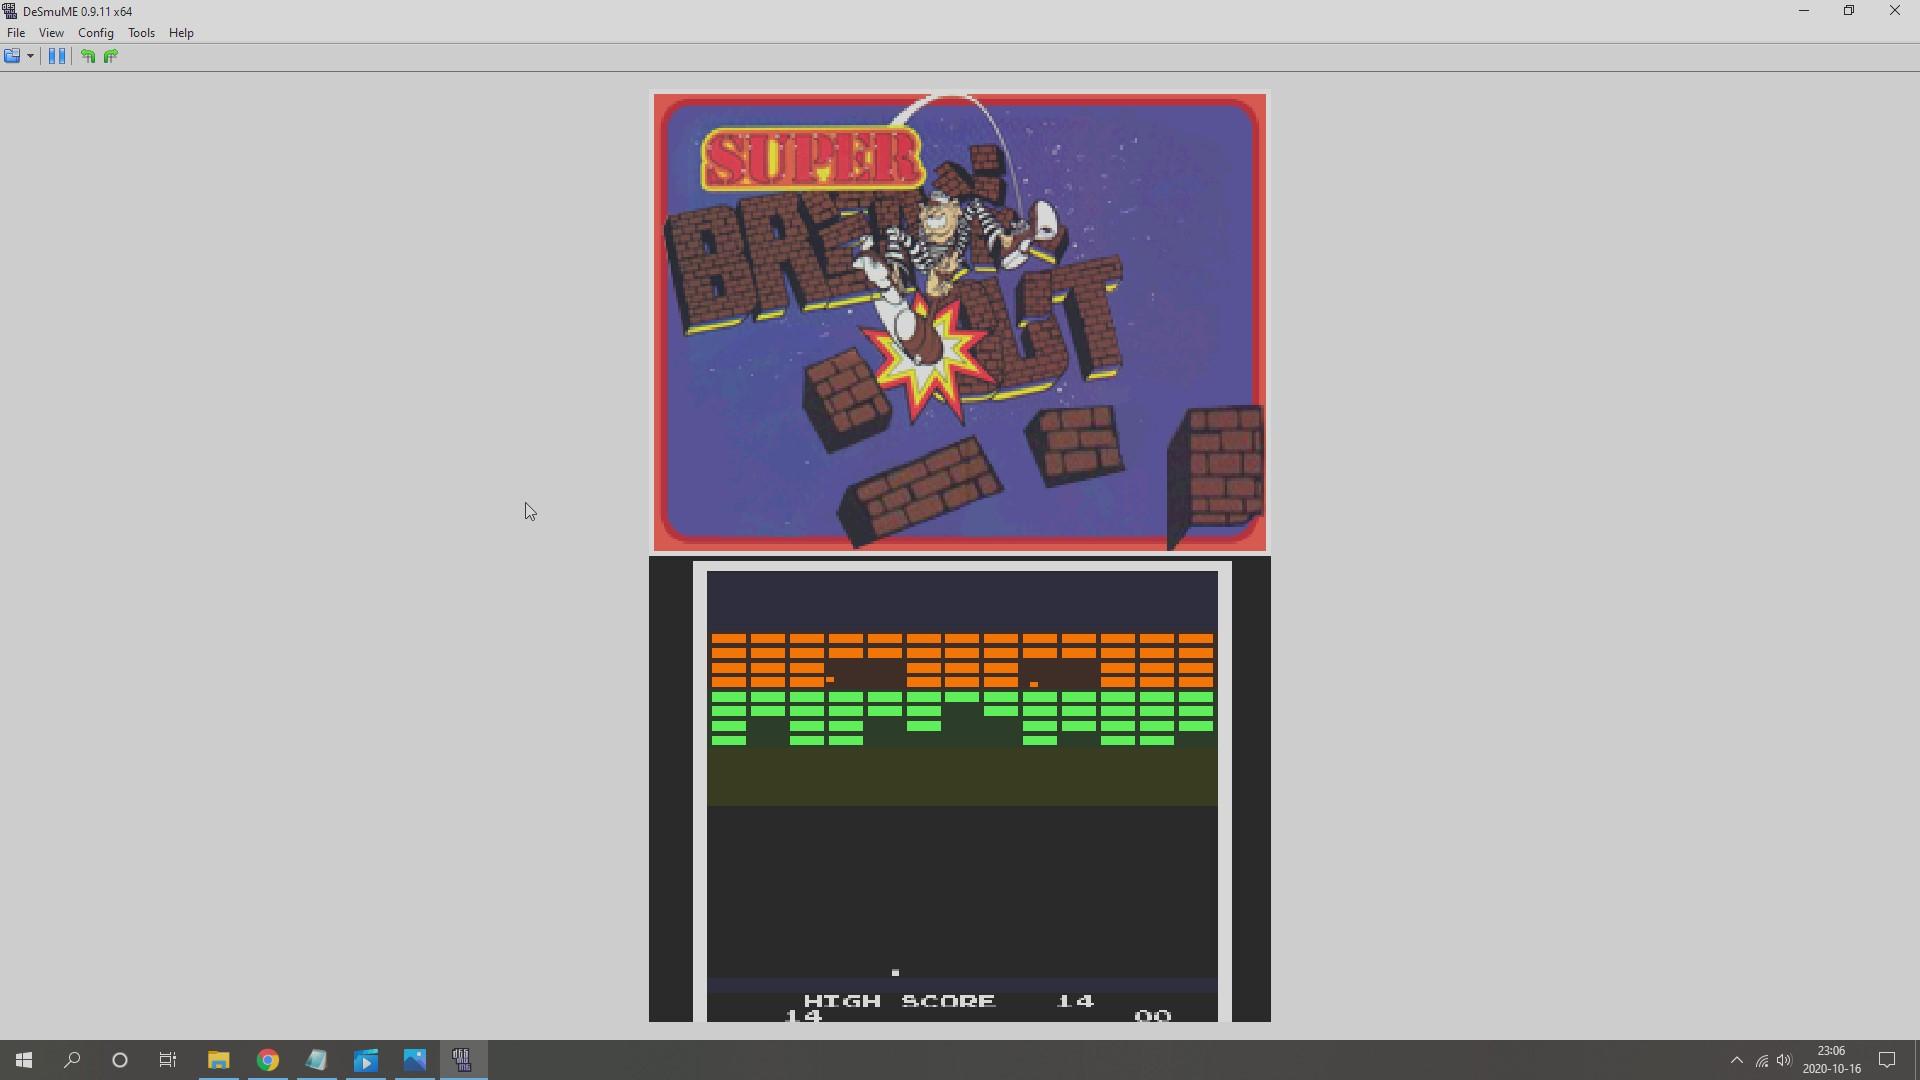 AkinNahtanoj: Atari Greatest Hits: Volume 2: Super Breakout [Arcade] (Nintendo DS Emulated) 14 points on 2020-10-16 16:09:50